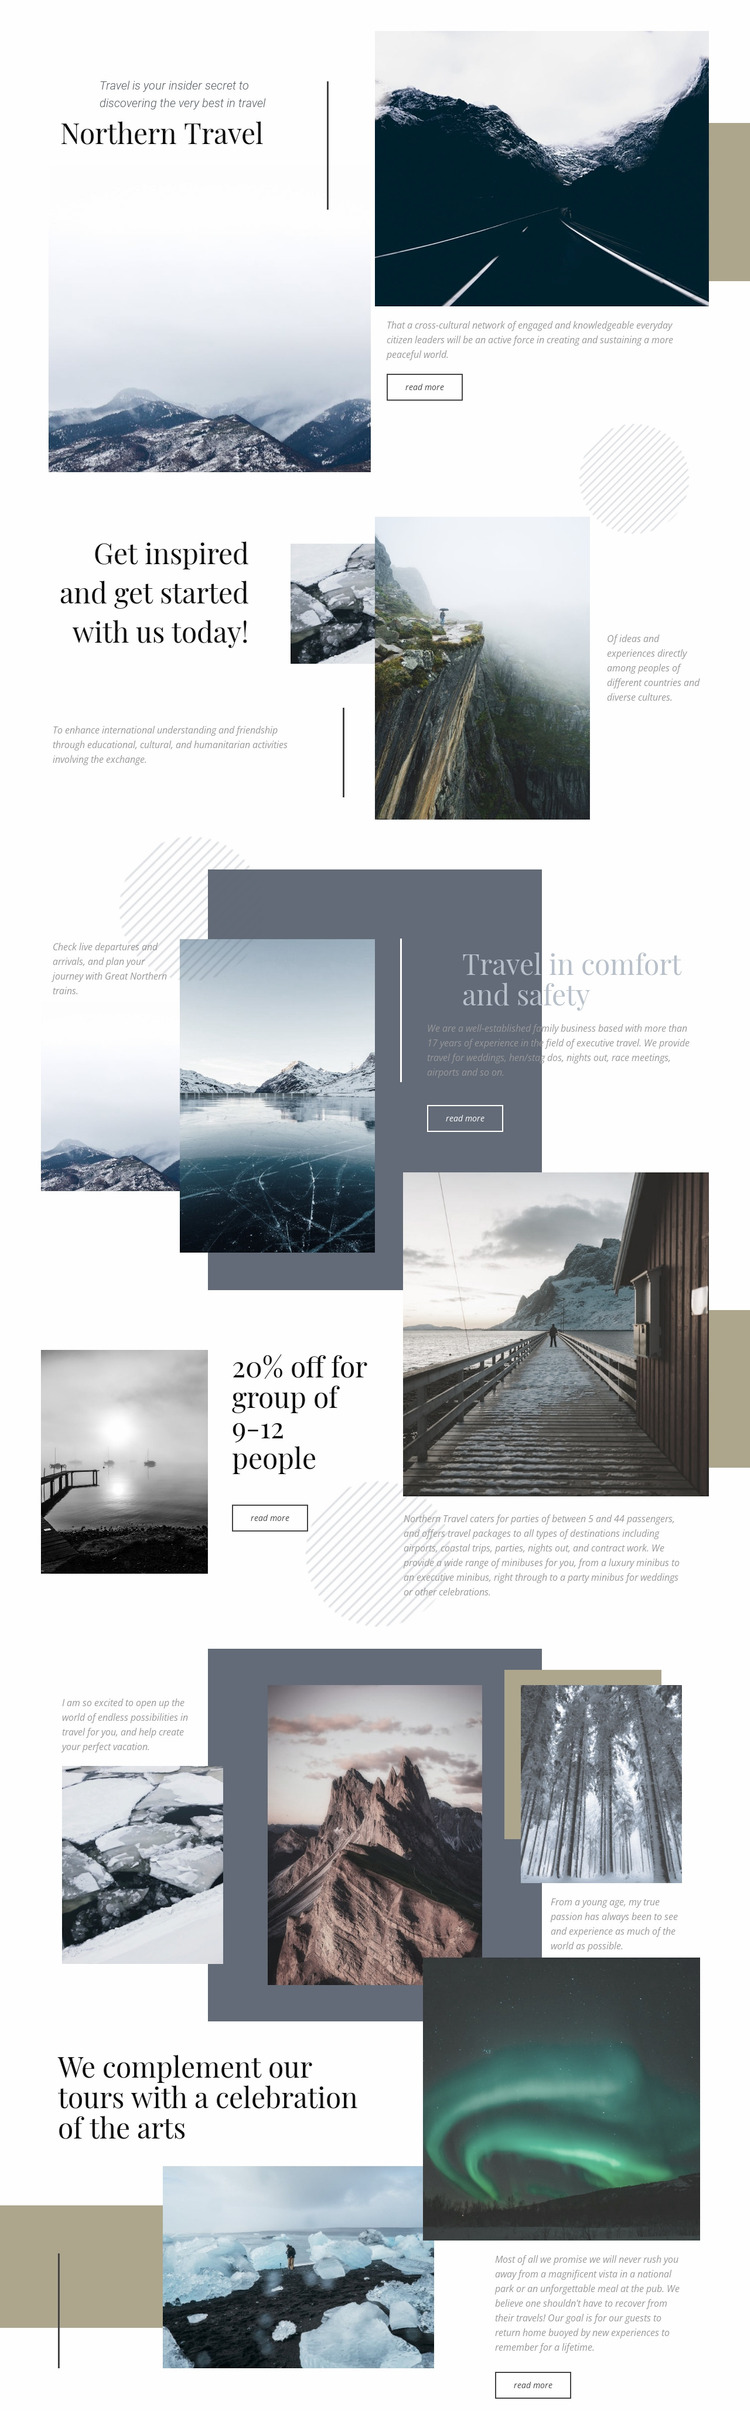 Northern Travel WordPress Website Builder